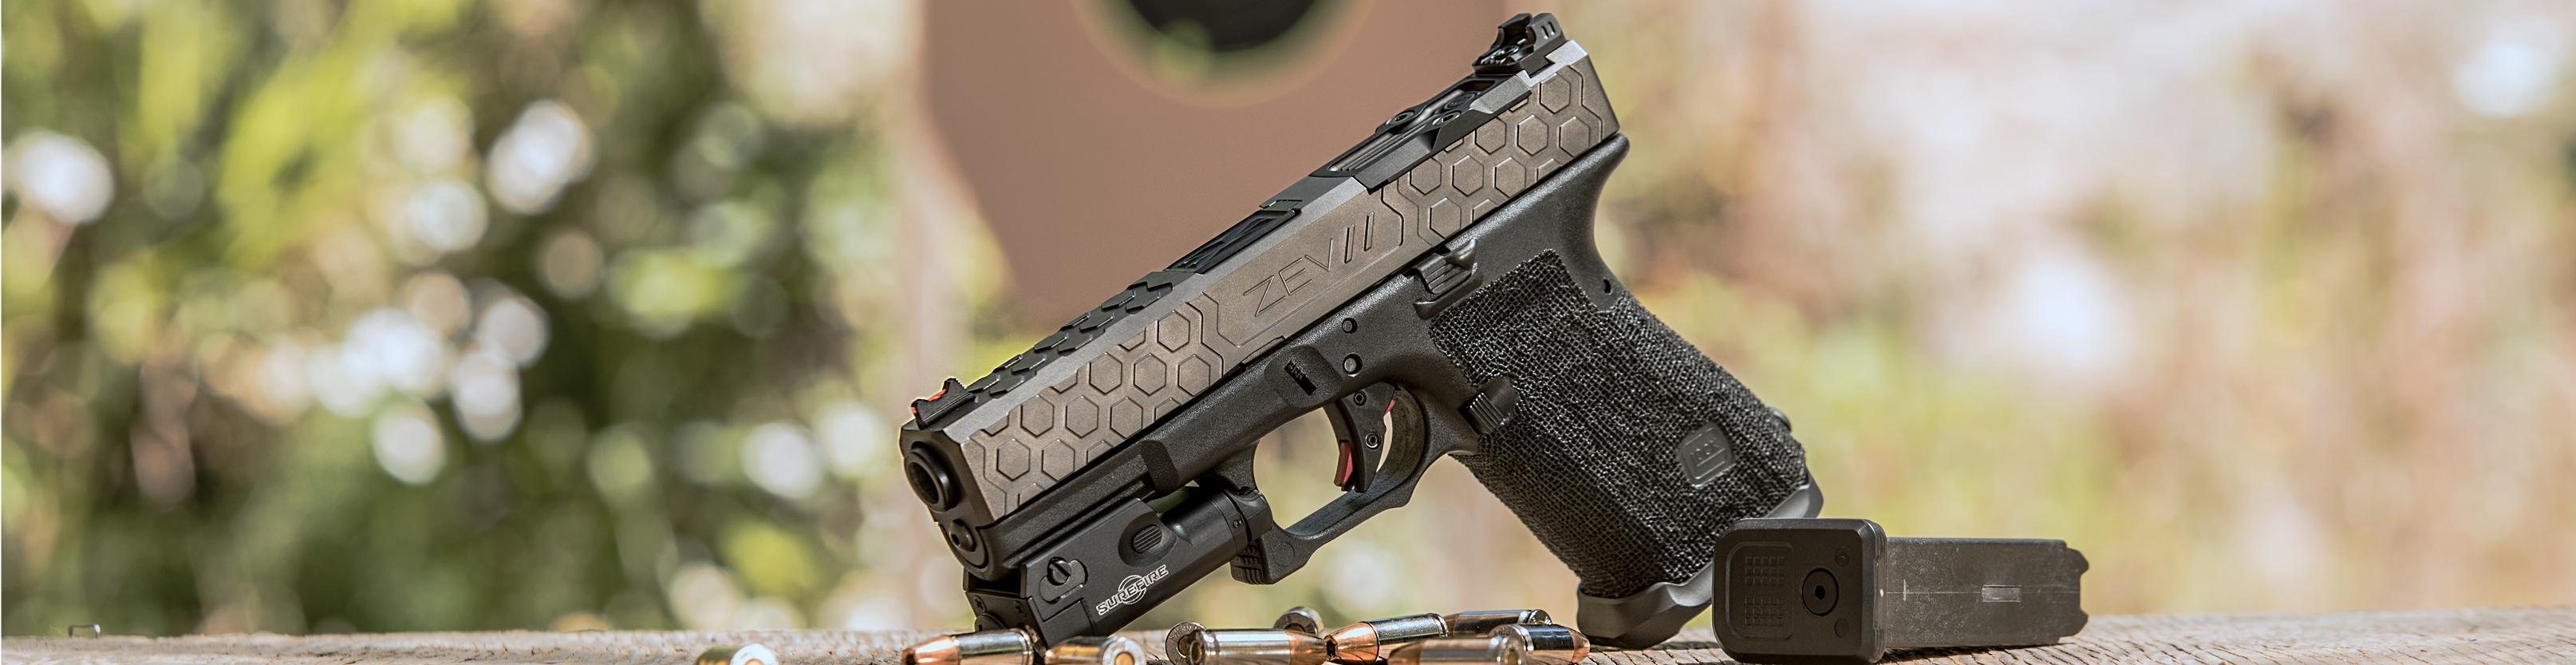 pistol_category.jpg